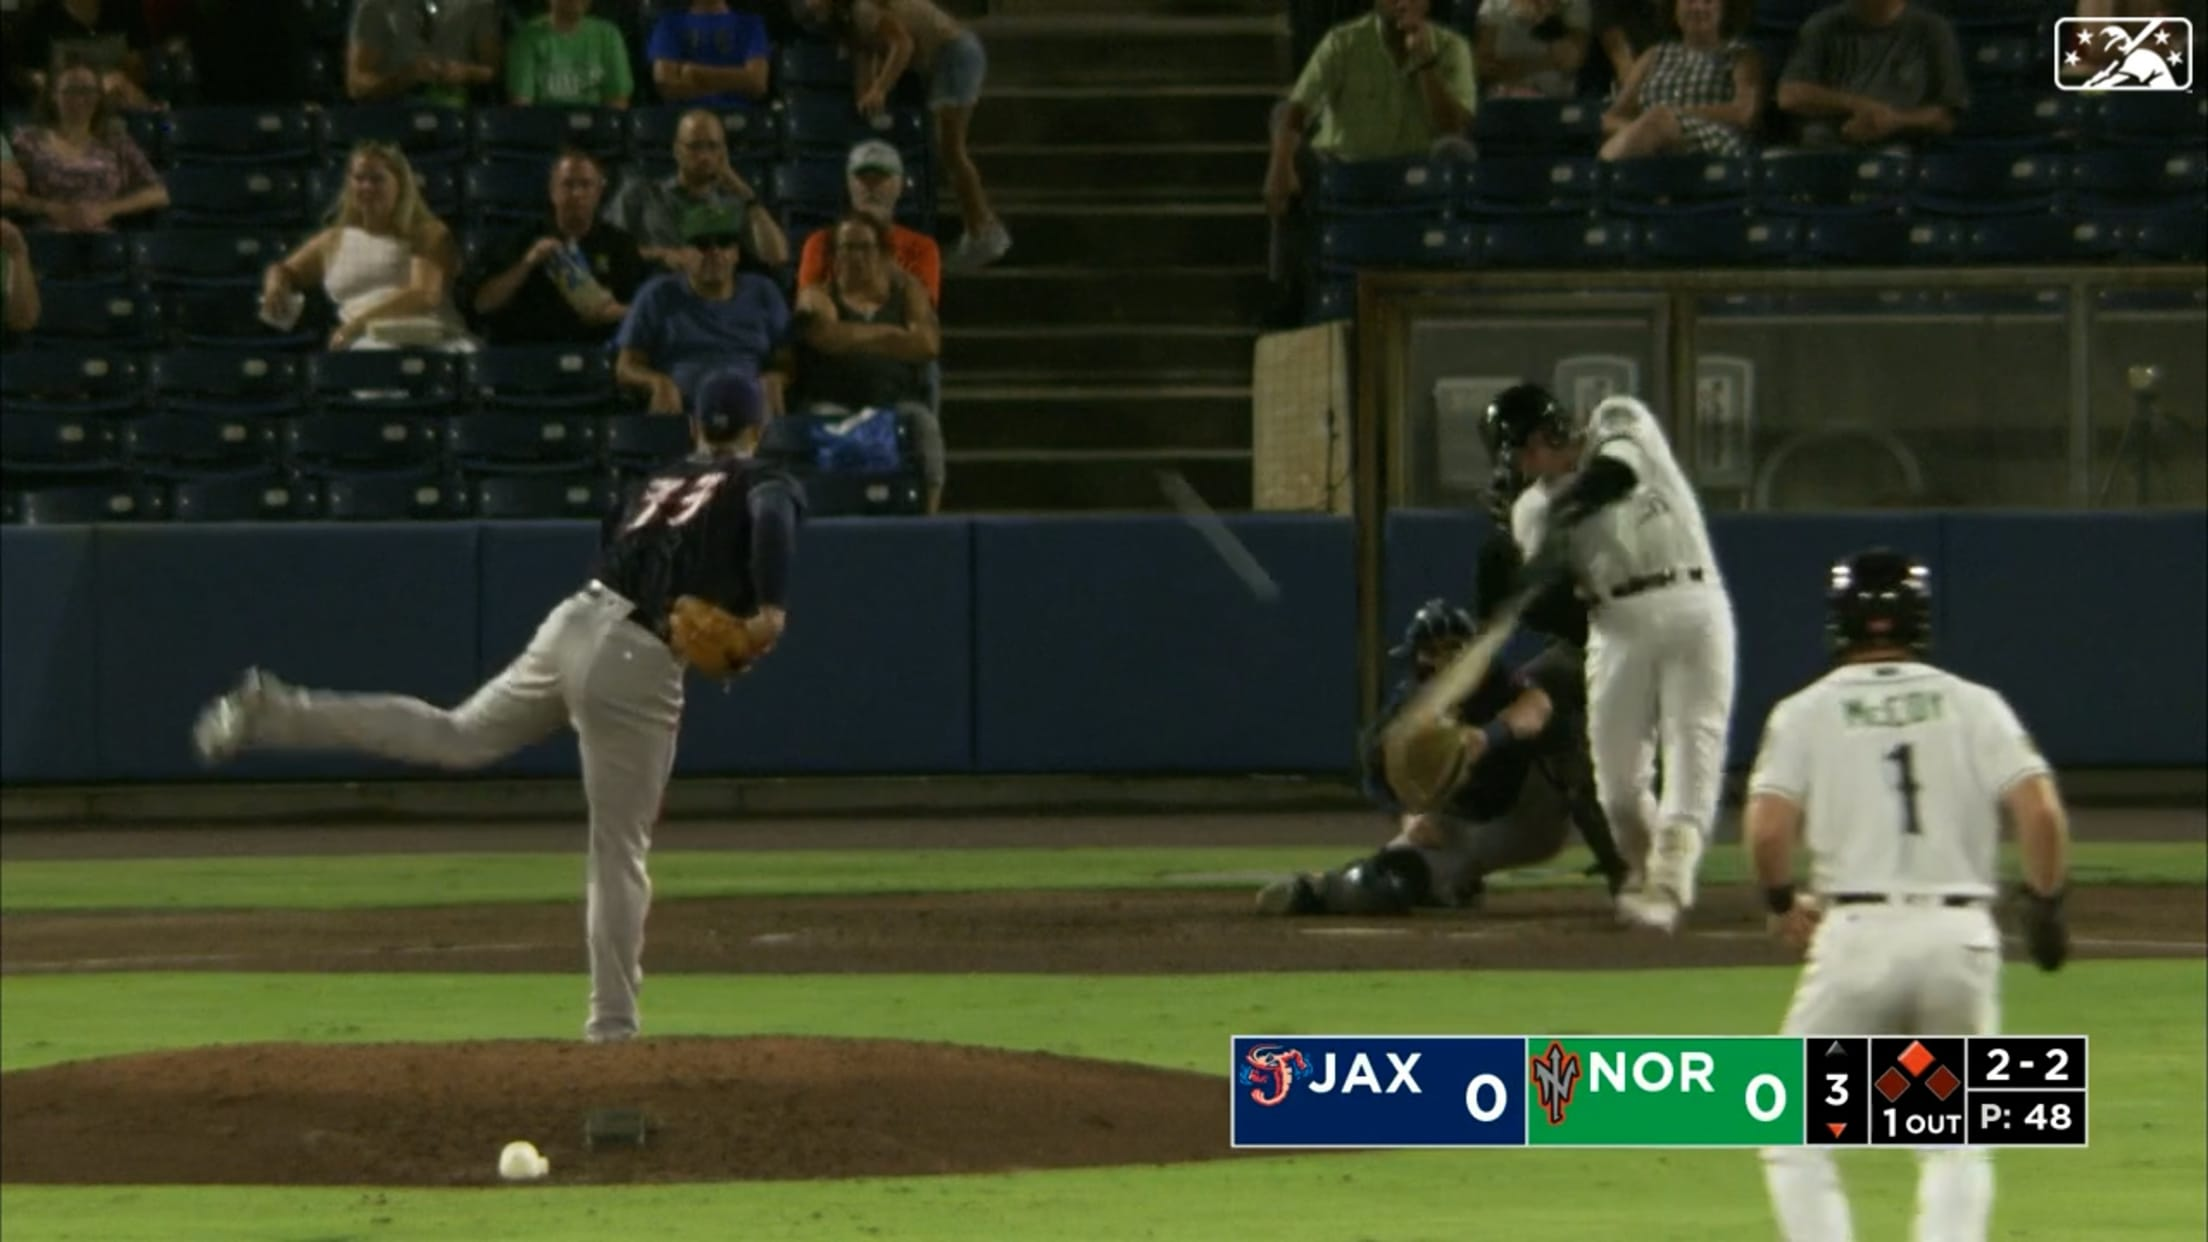 Adley Rutschman laces RBI triple